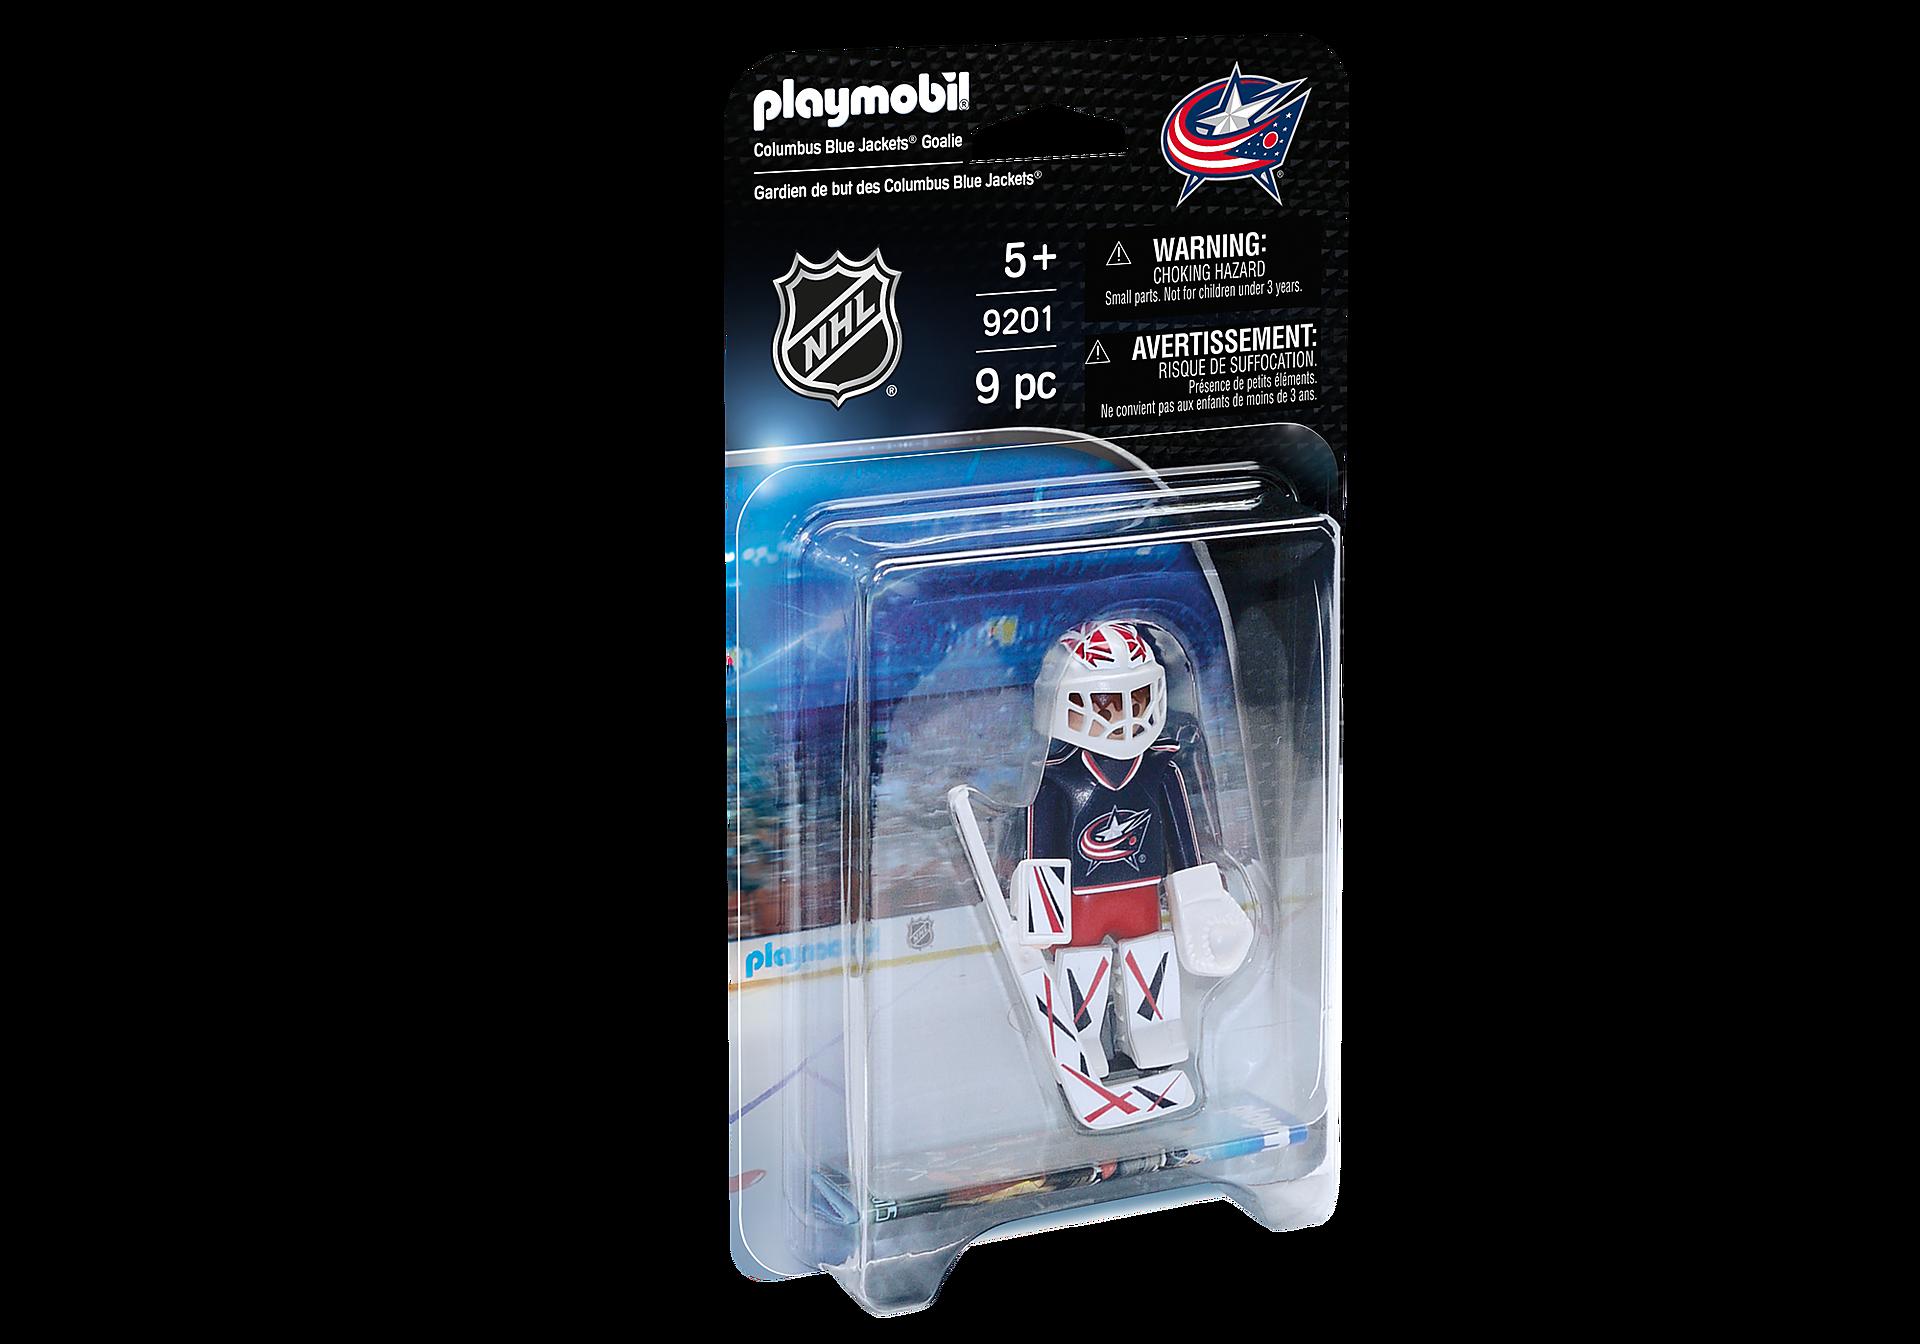 http://media.playmobil.com/i/playmobil/9201_product_box_front/NHL® Columbus Blue Jackets® Goalie